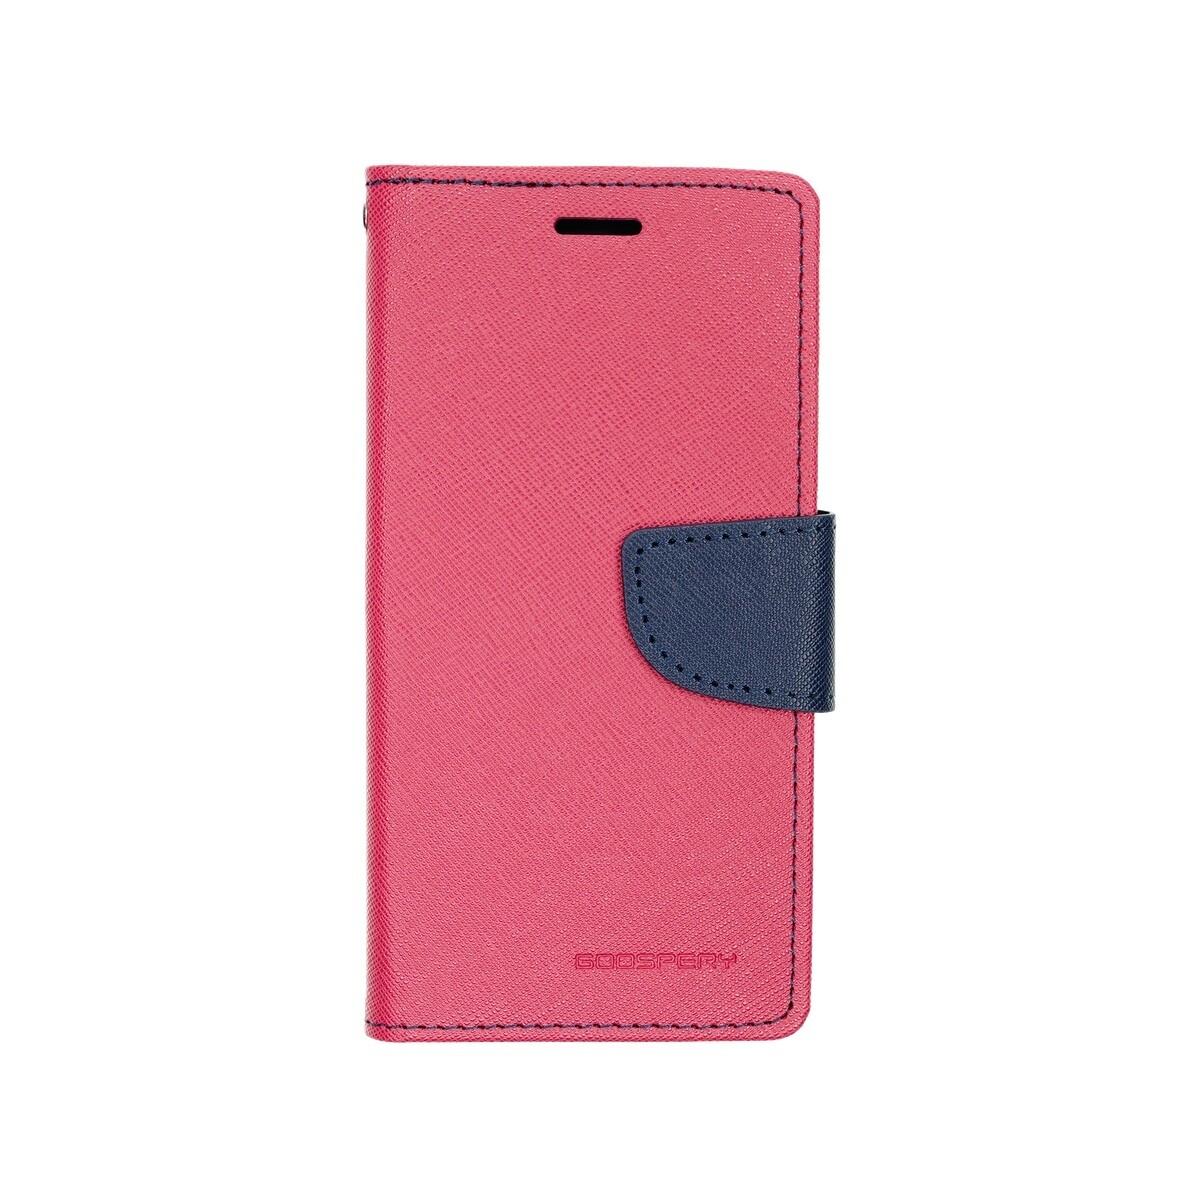 Estuche GOOSPERY Fancy Diary Fucsia/Azul Marino SAMSUNG S9